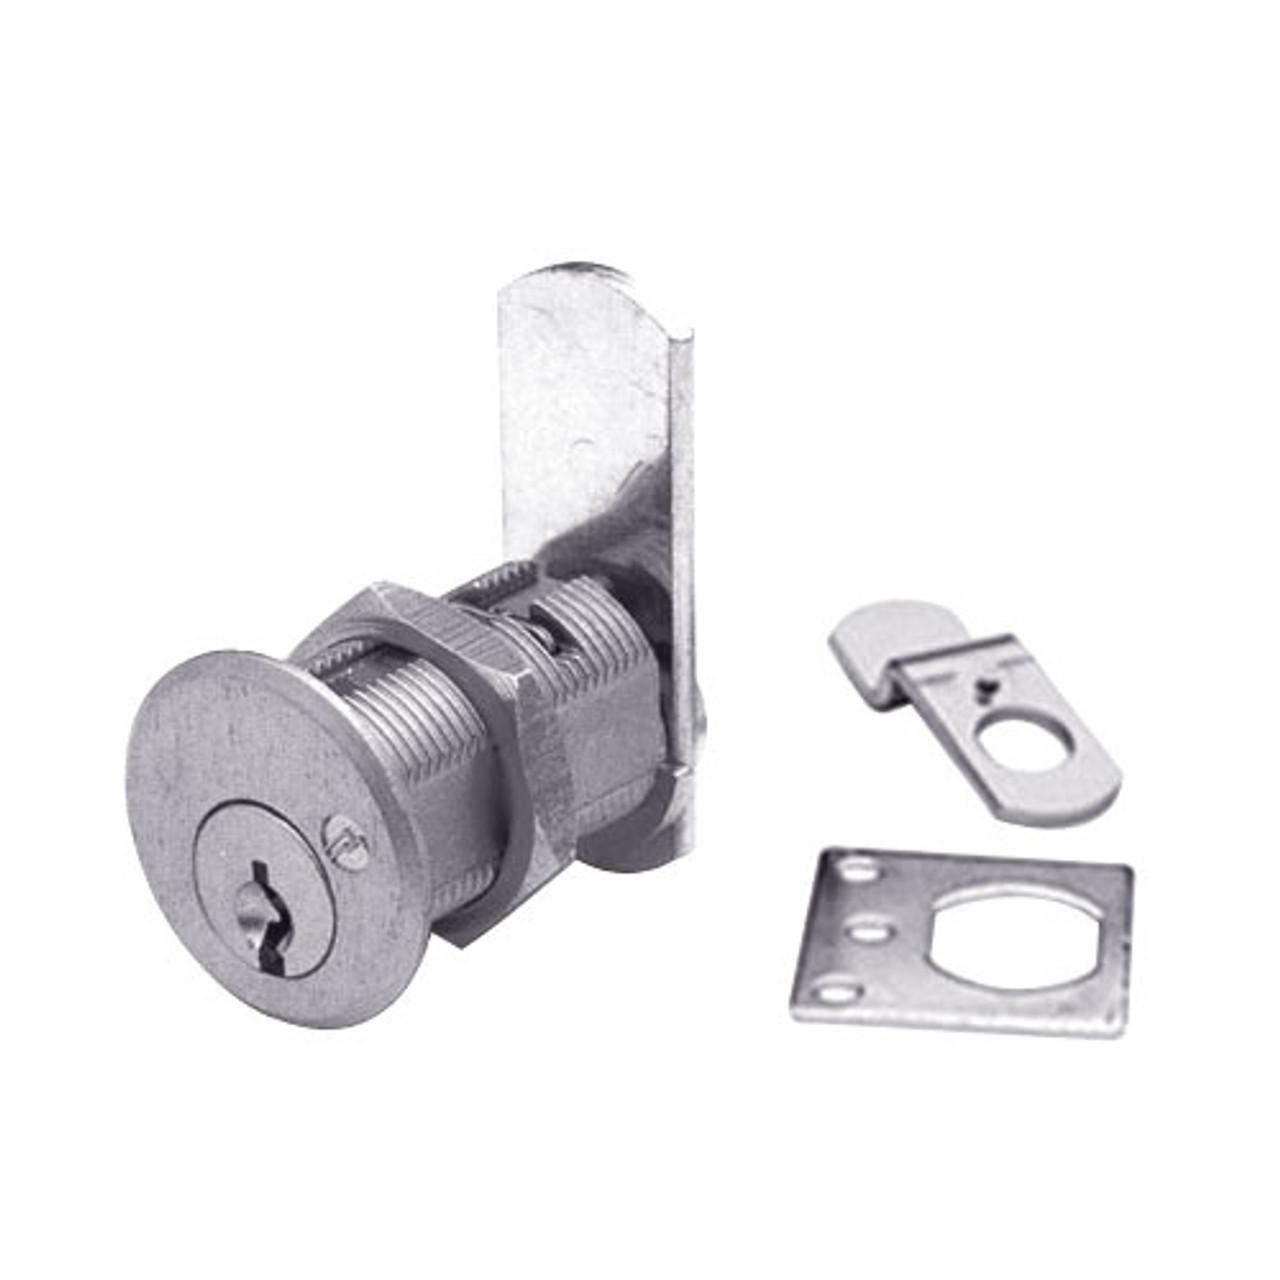 Olympus DCN3-MK-26D Cam Locks in Satin Chrome Finish